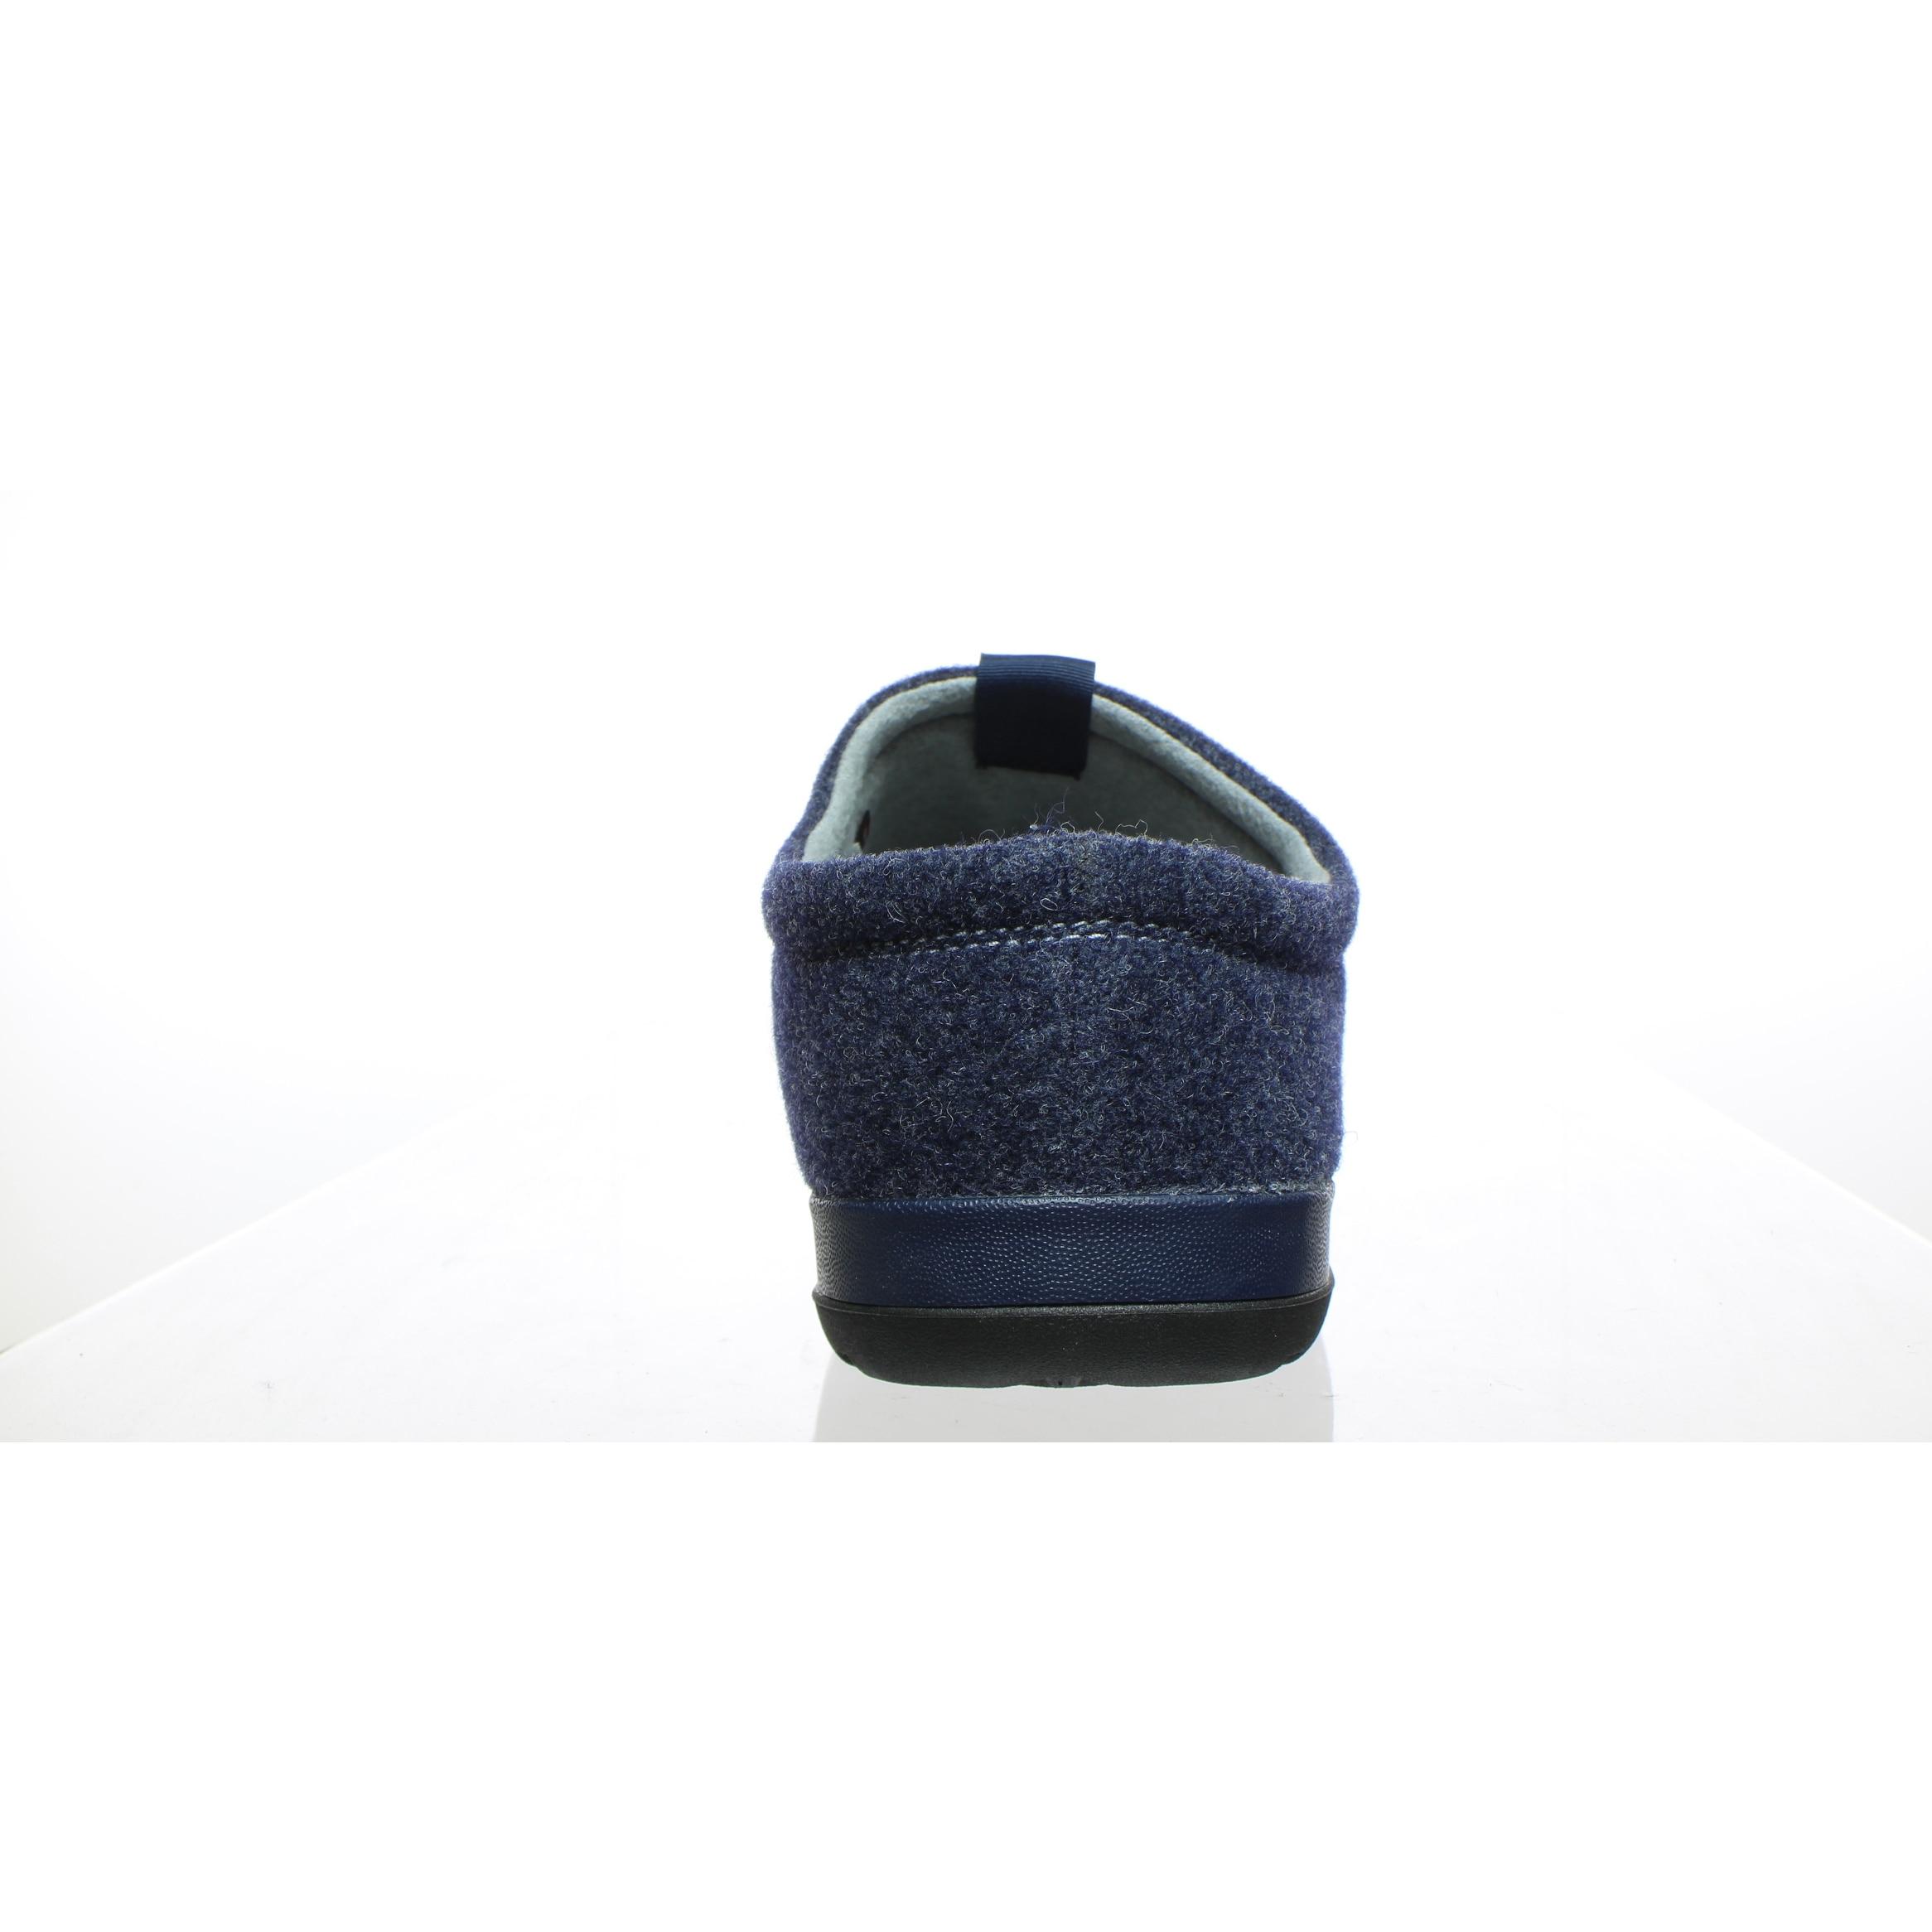 b0bfb24083b UGG Mens Samvitt New Navy Mule Slippers Size 14